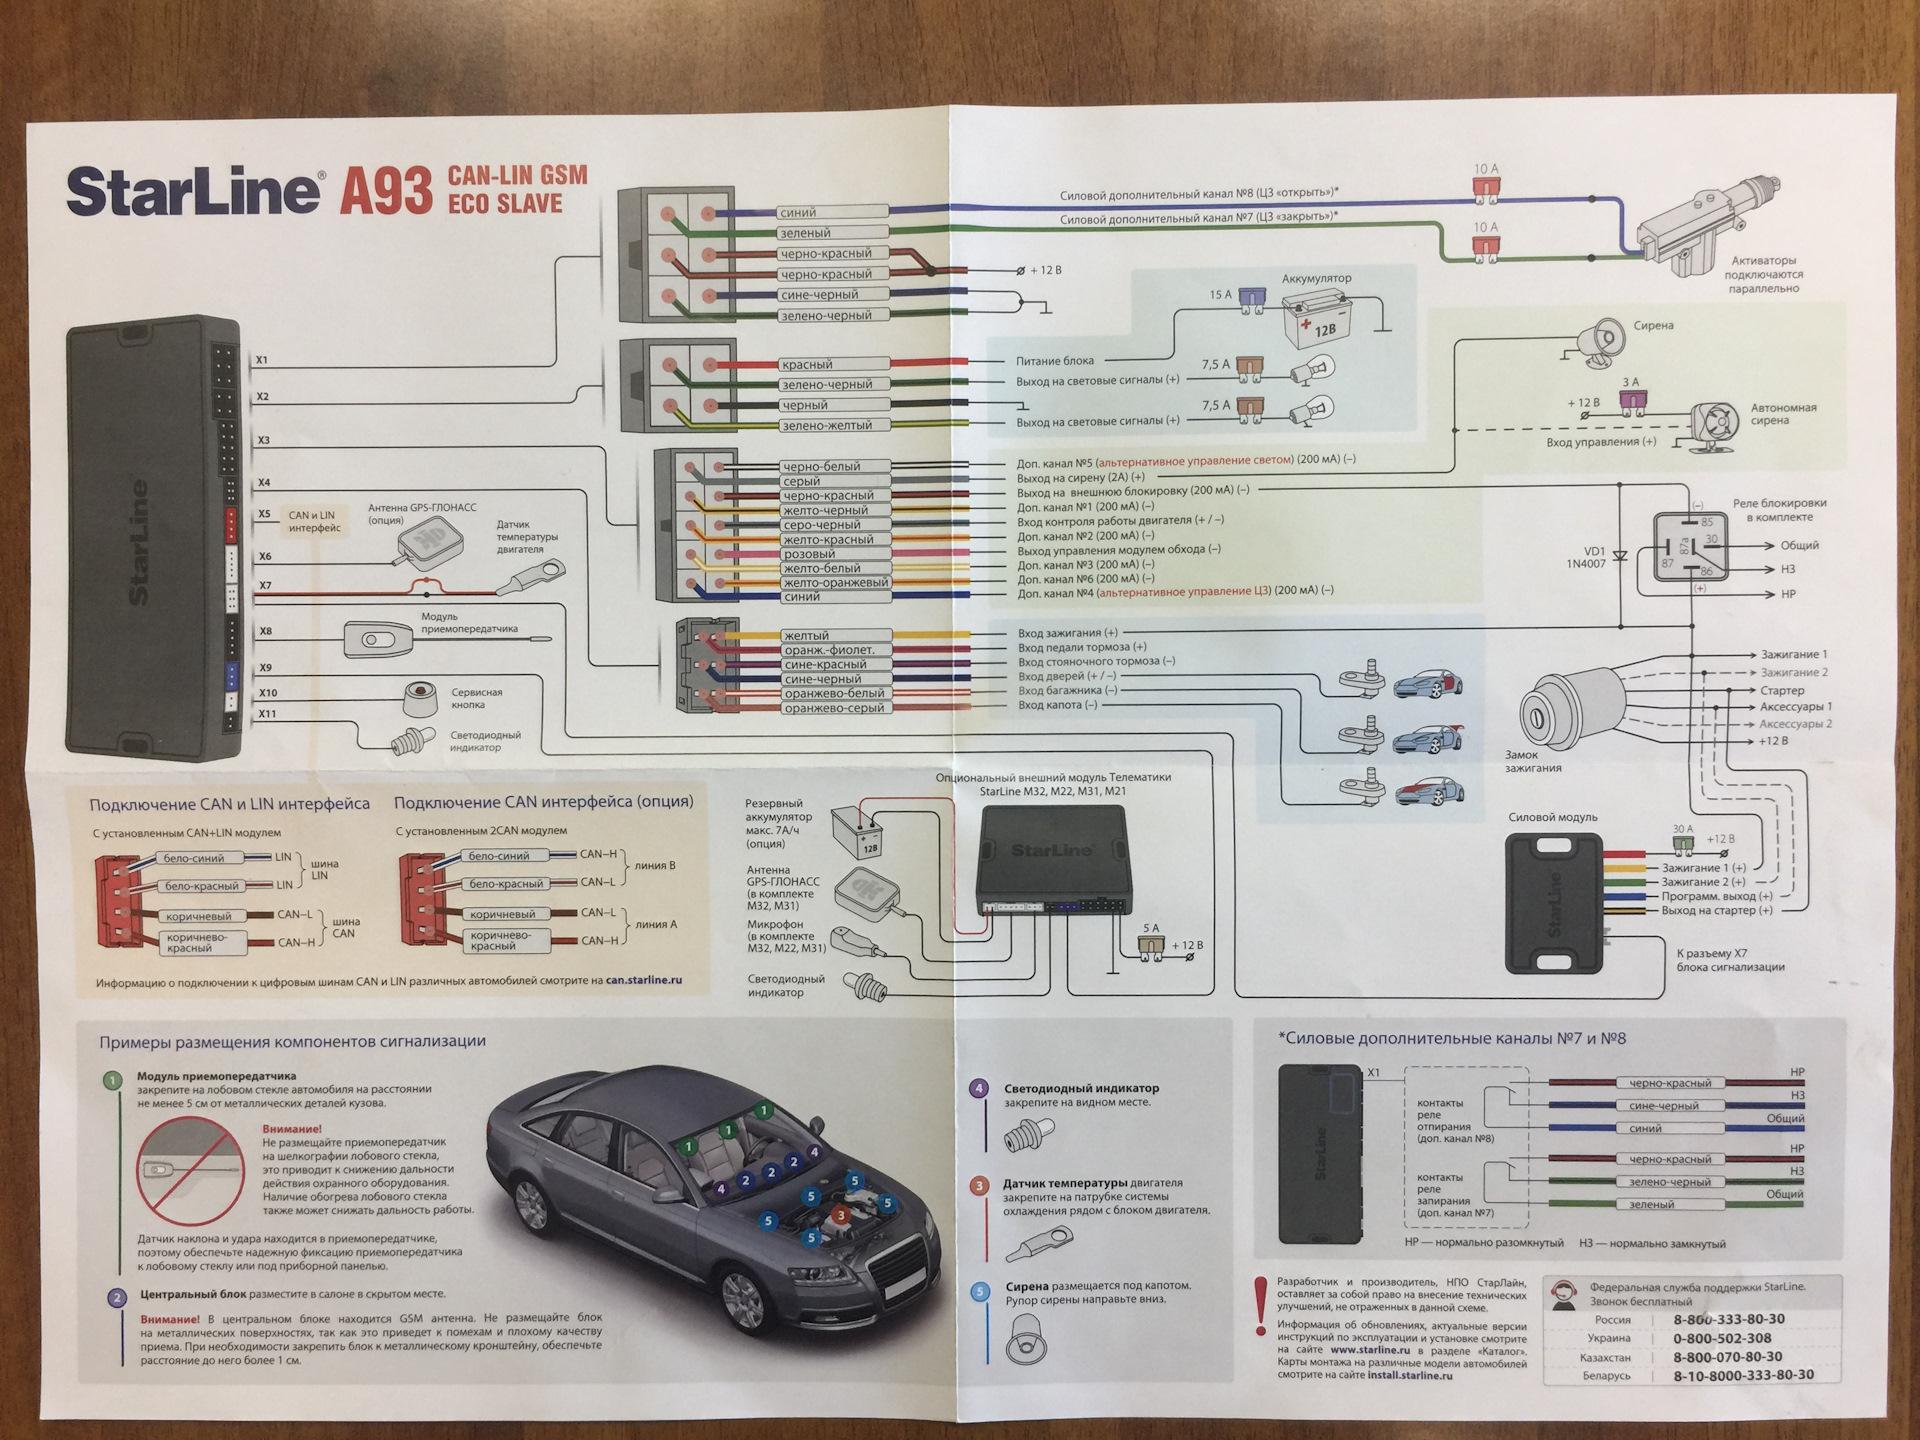 Установка сигнализации StarLine А93 CAN+LIN GSM ECO SLAVE (Made in Russia) - бортжурнал Toyota RAV4 B&W //THERE'S ONLY ONE// 201